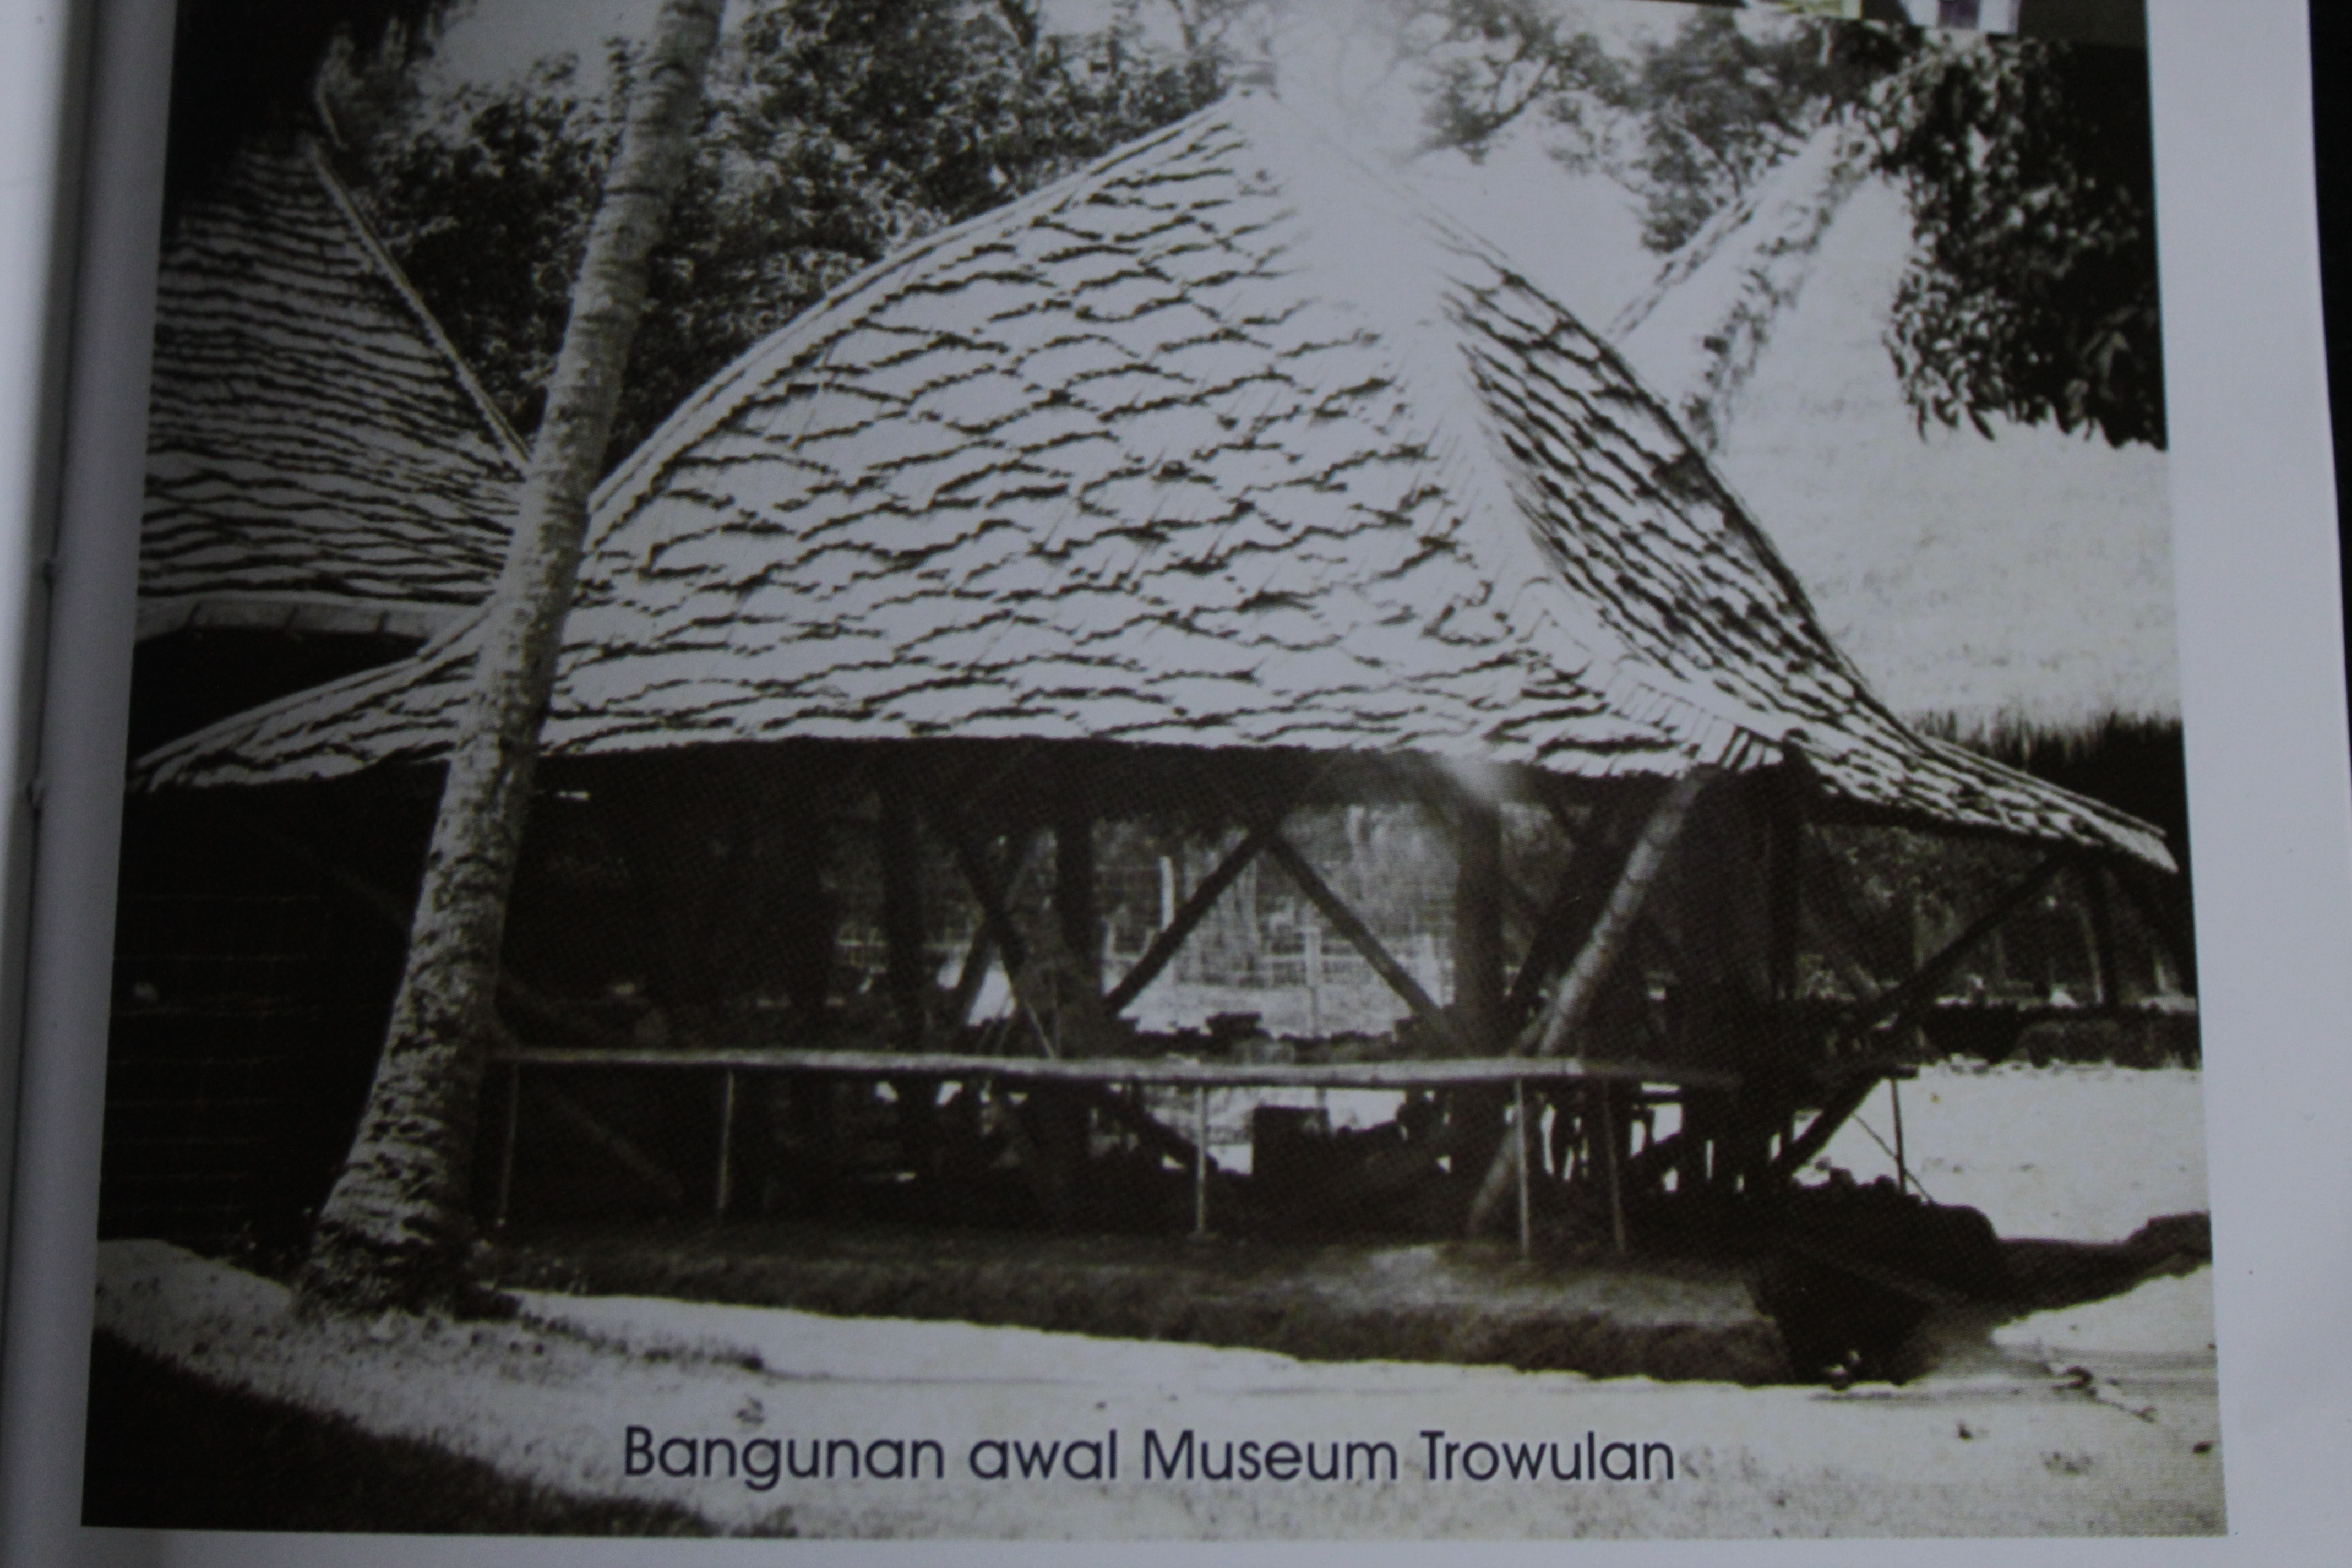 Museum Daring Majapahit Cerita Page 2 Trowulan Pusat Informasi Didirikan